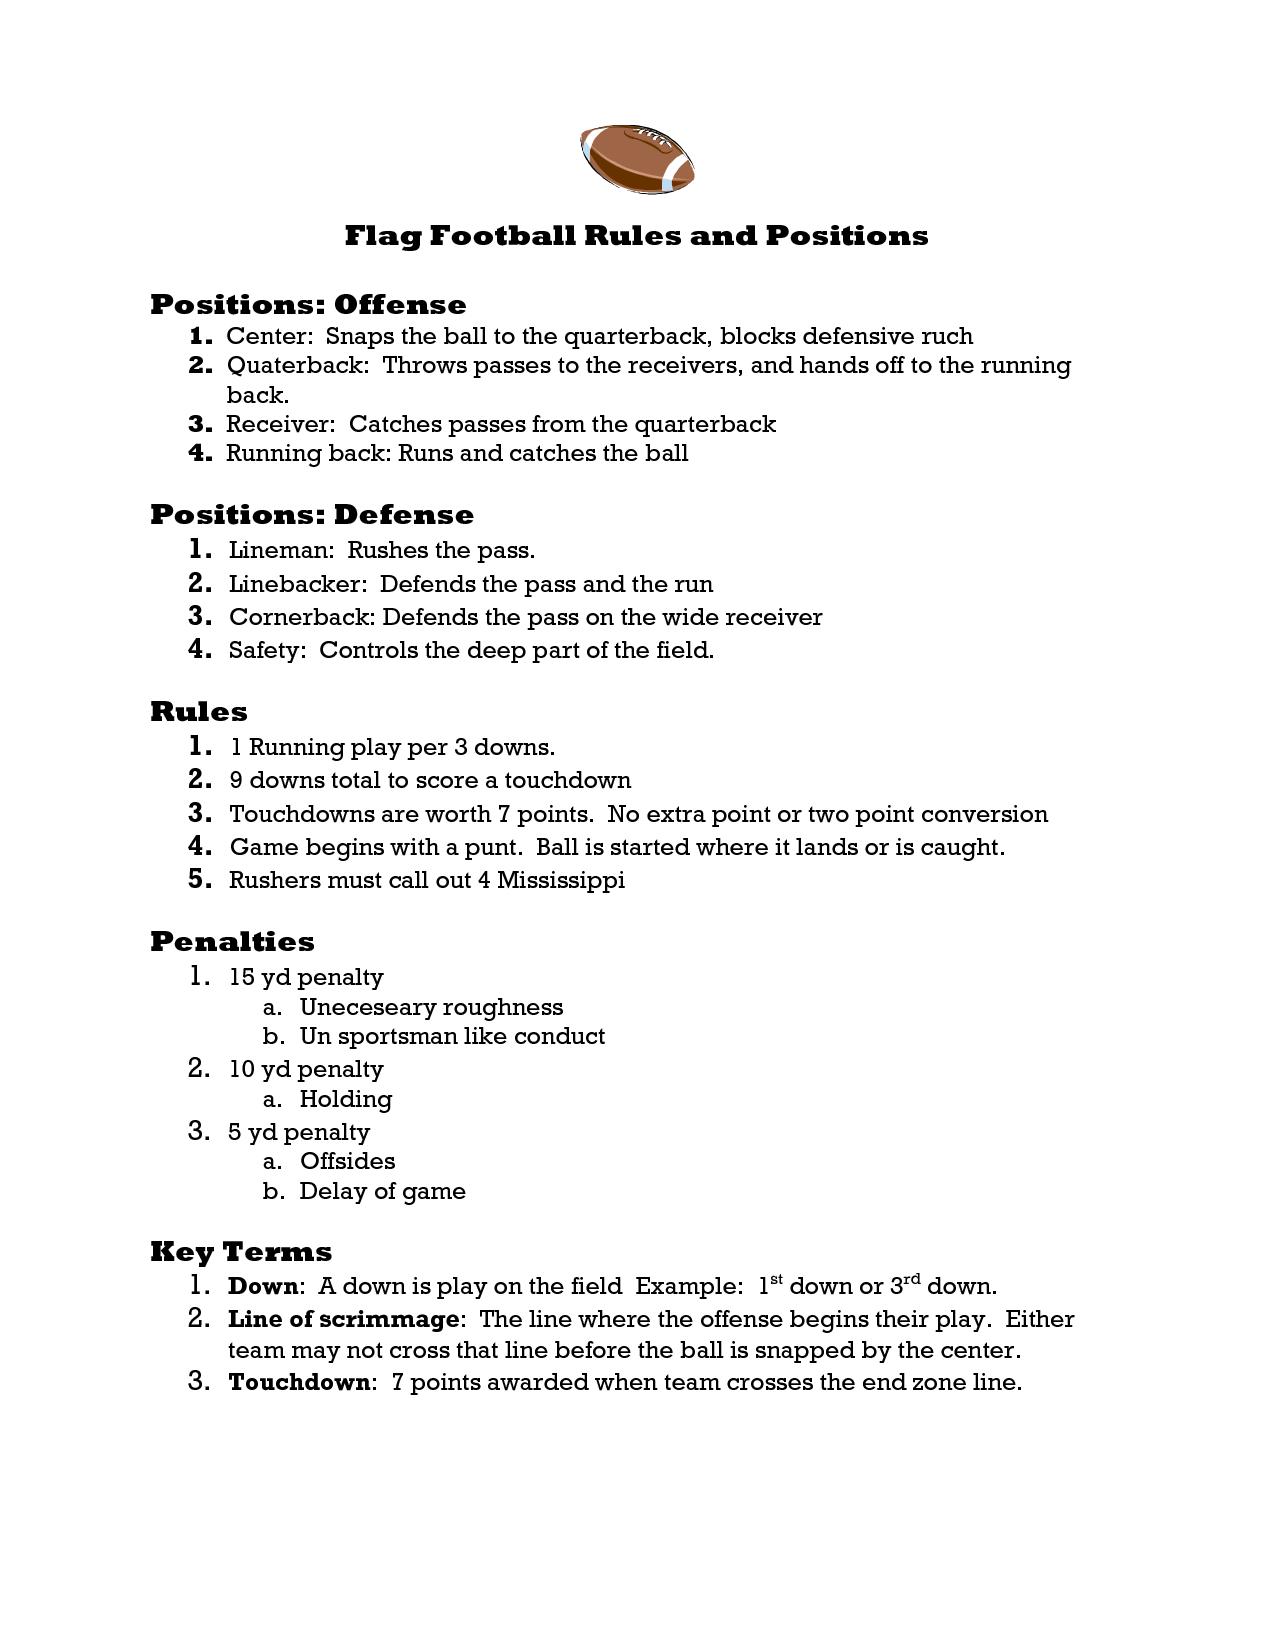 medium resolution of image result for flag football rules